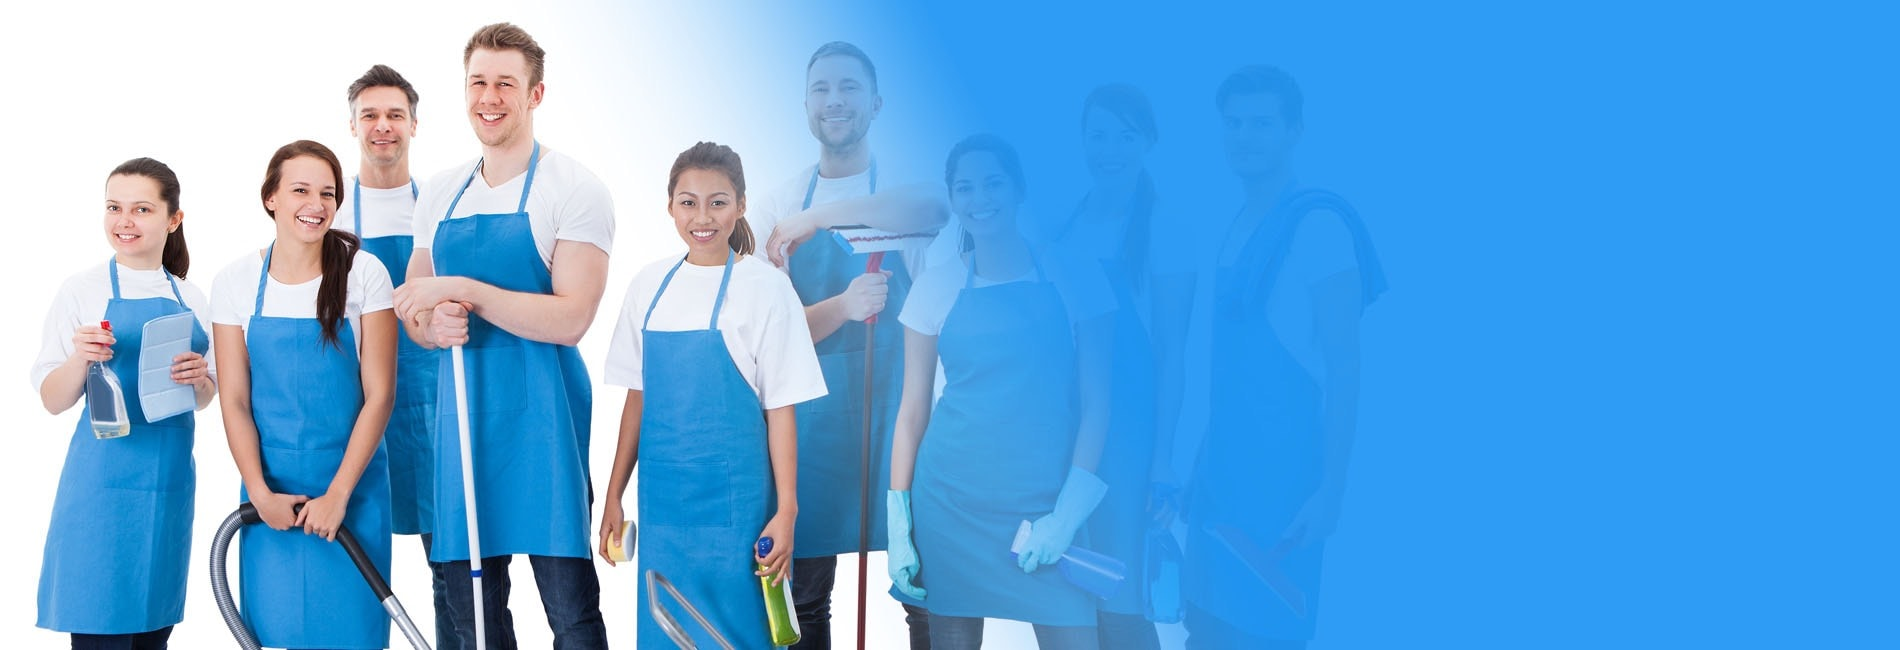 EXPERT CLEANING - клининговая компания Алматы